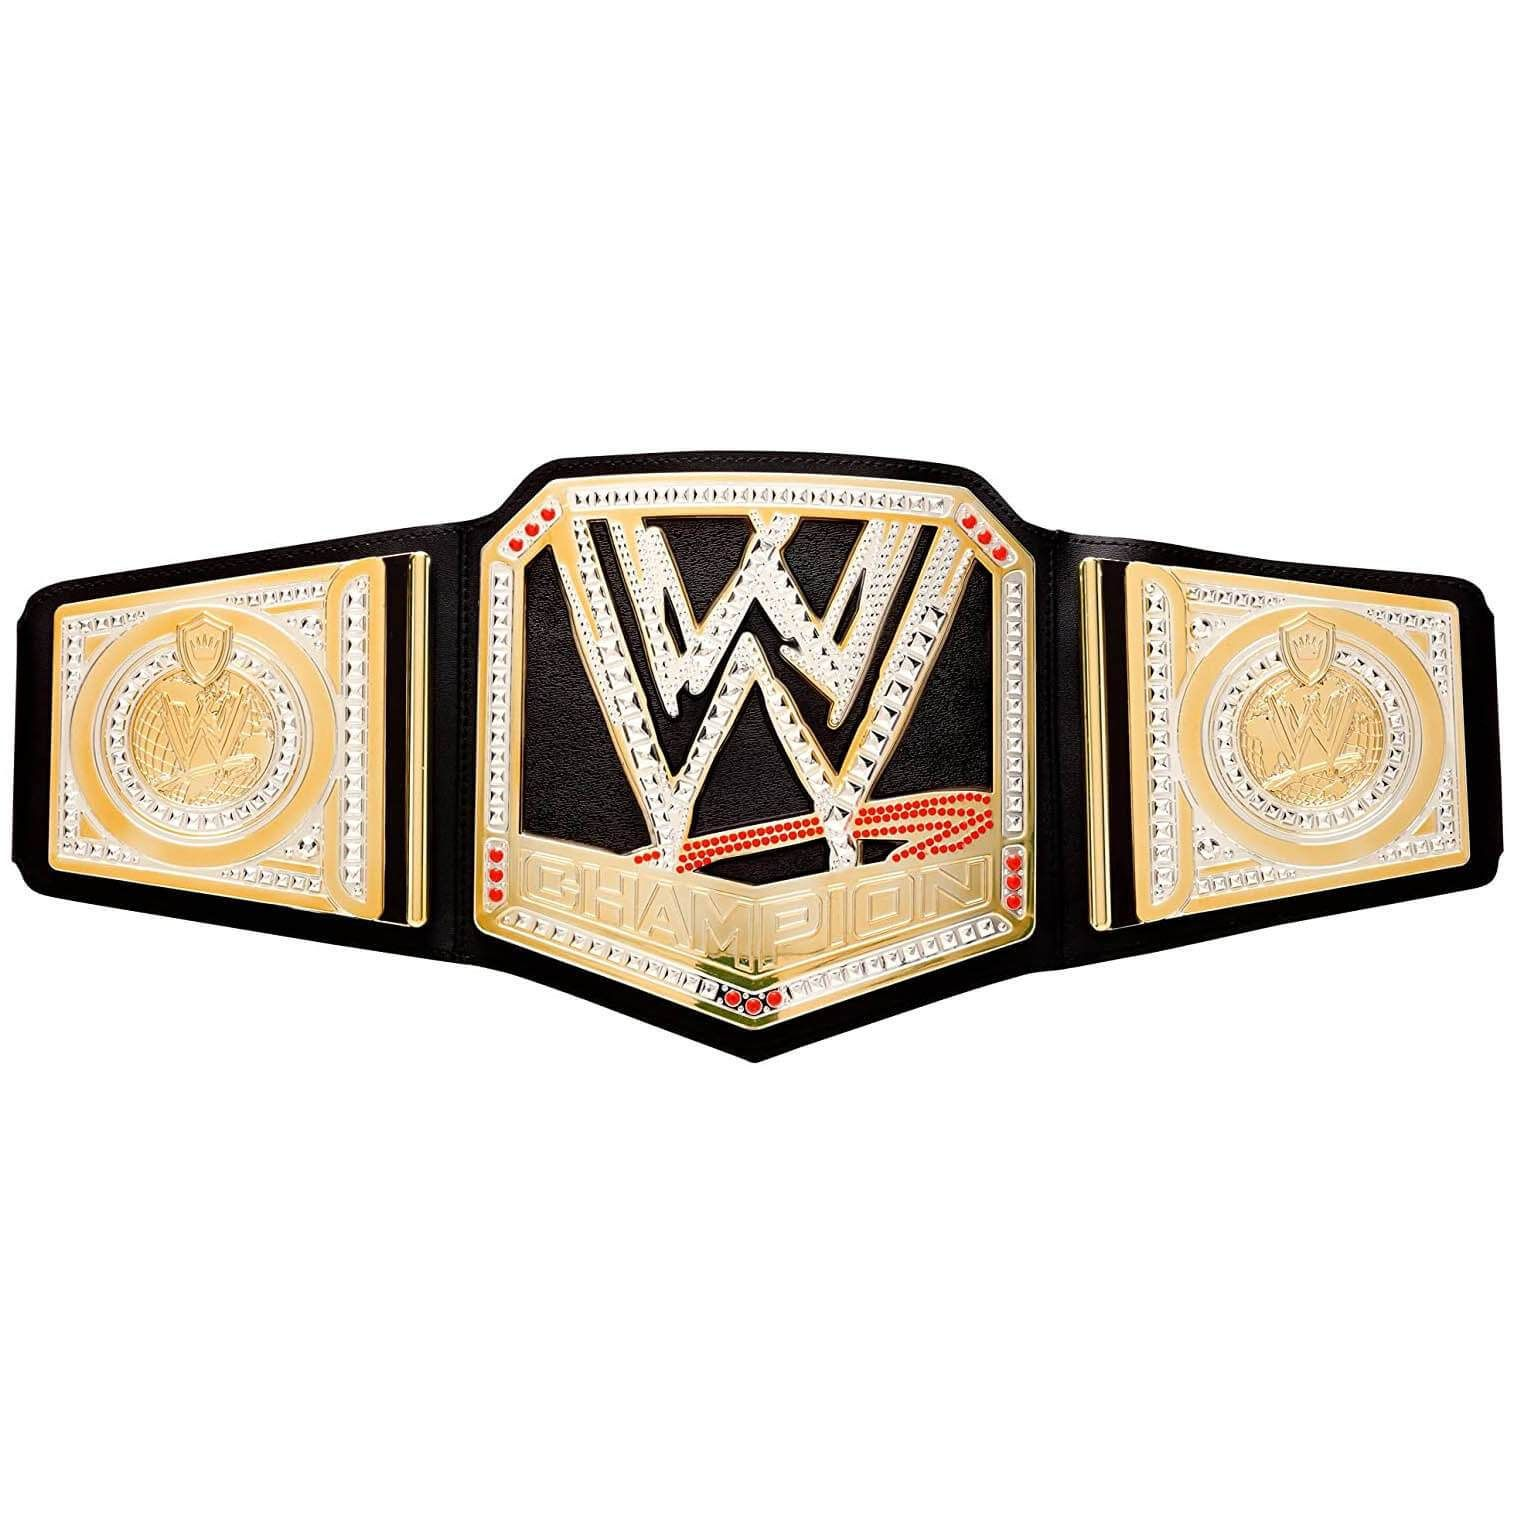 Wwe Championship Belt In 2021 Wwe Championship Belts Wwe Belts Wwe World